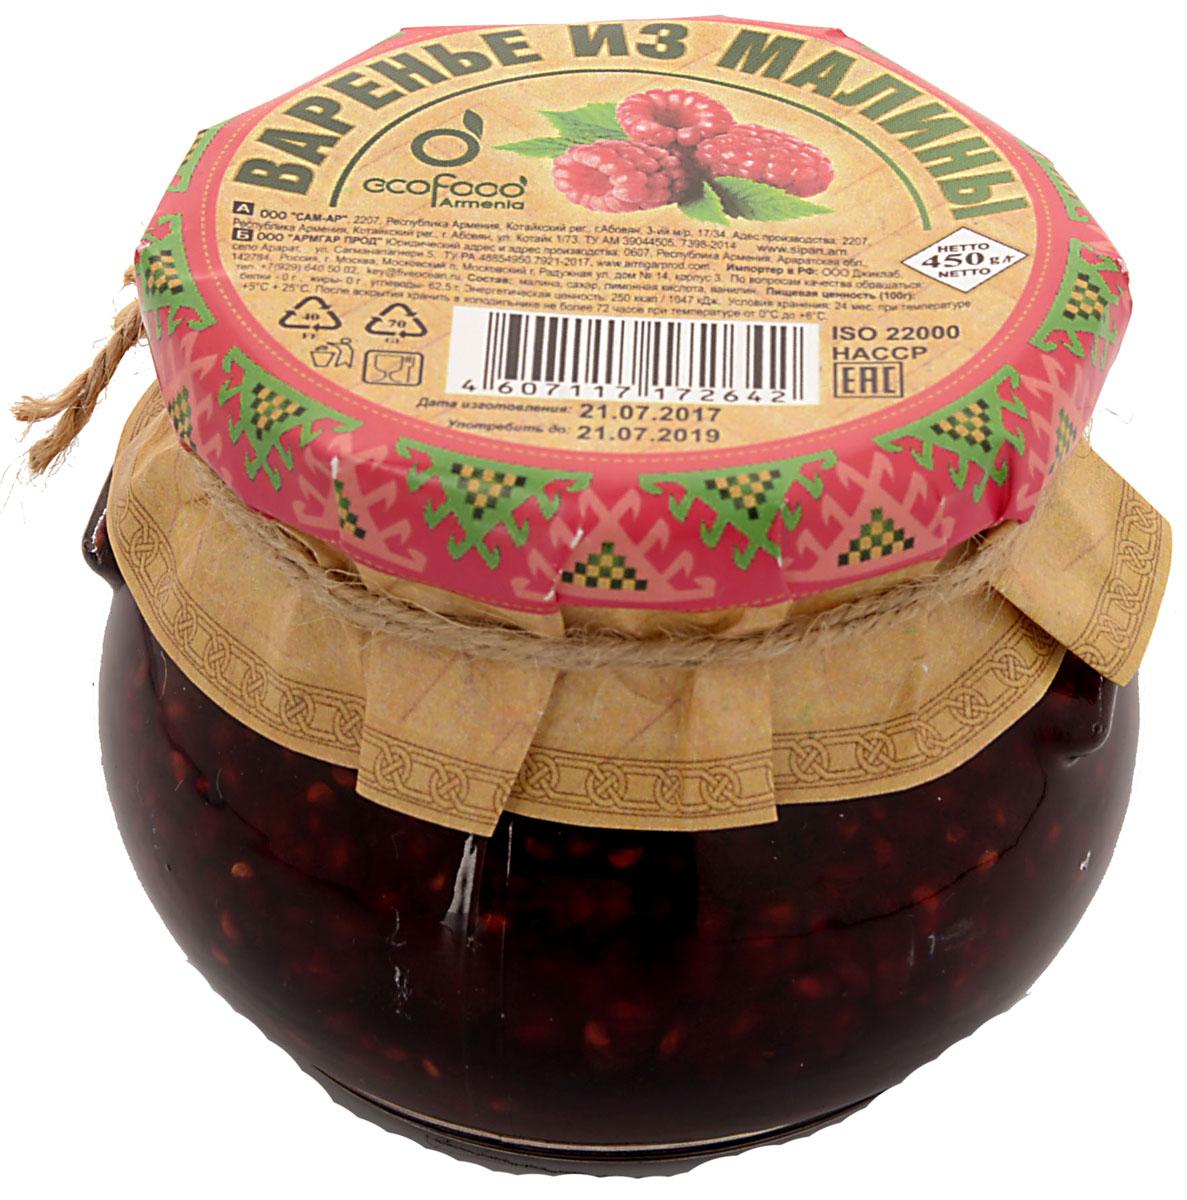 Ecofood Варенье из малины, 450 г ecofood уха по царски из осетра 530 г